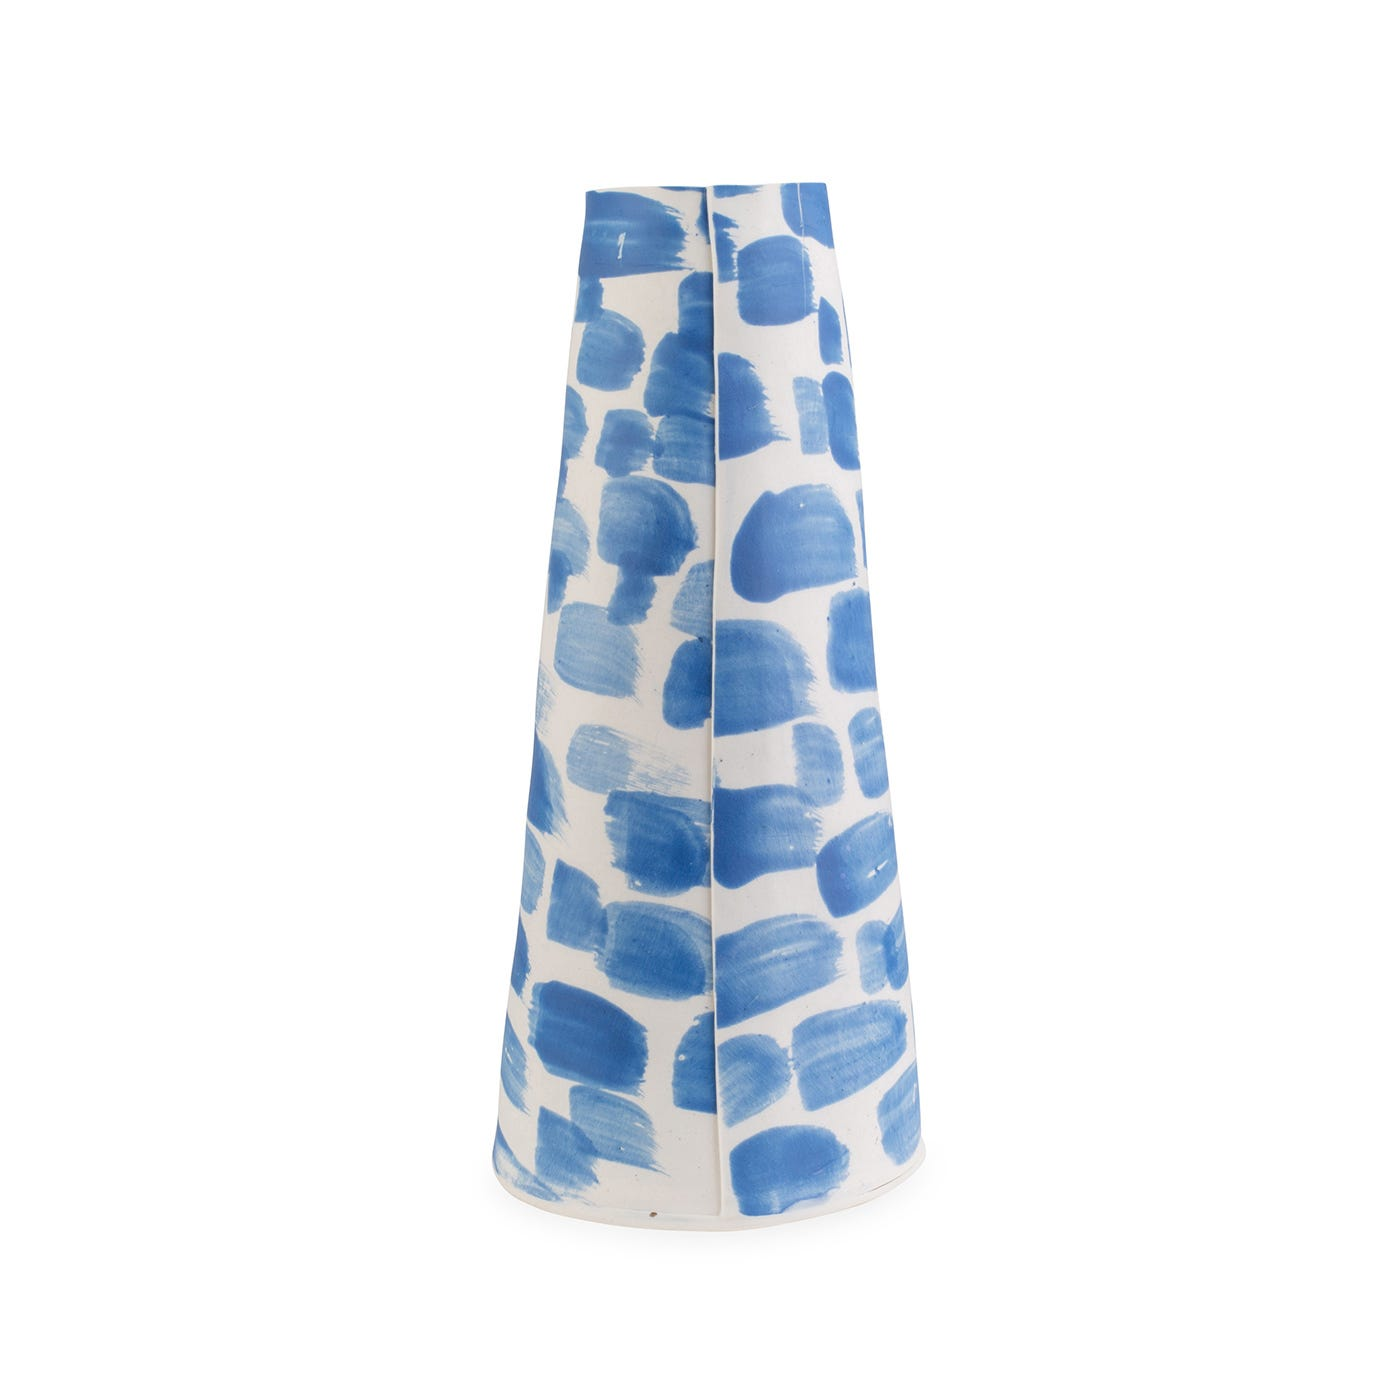 Taper Vase Blue Broad Brushstroke Extra Large